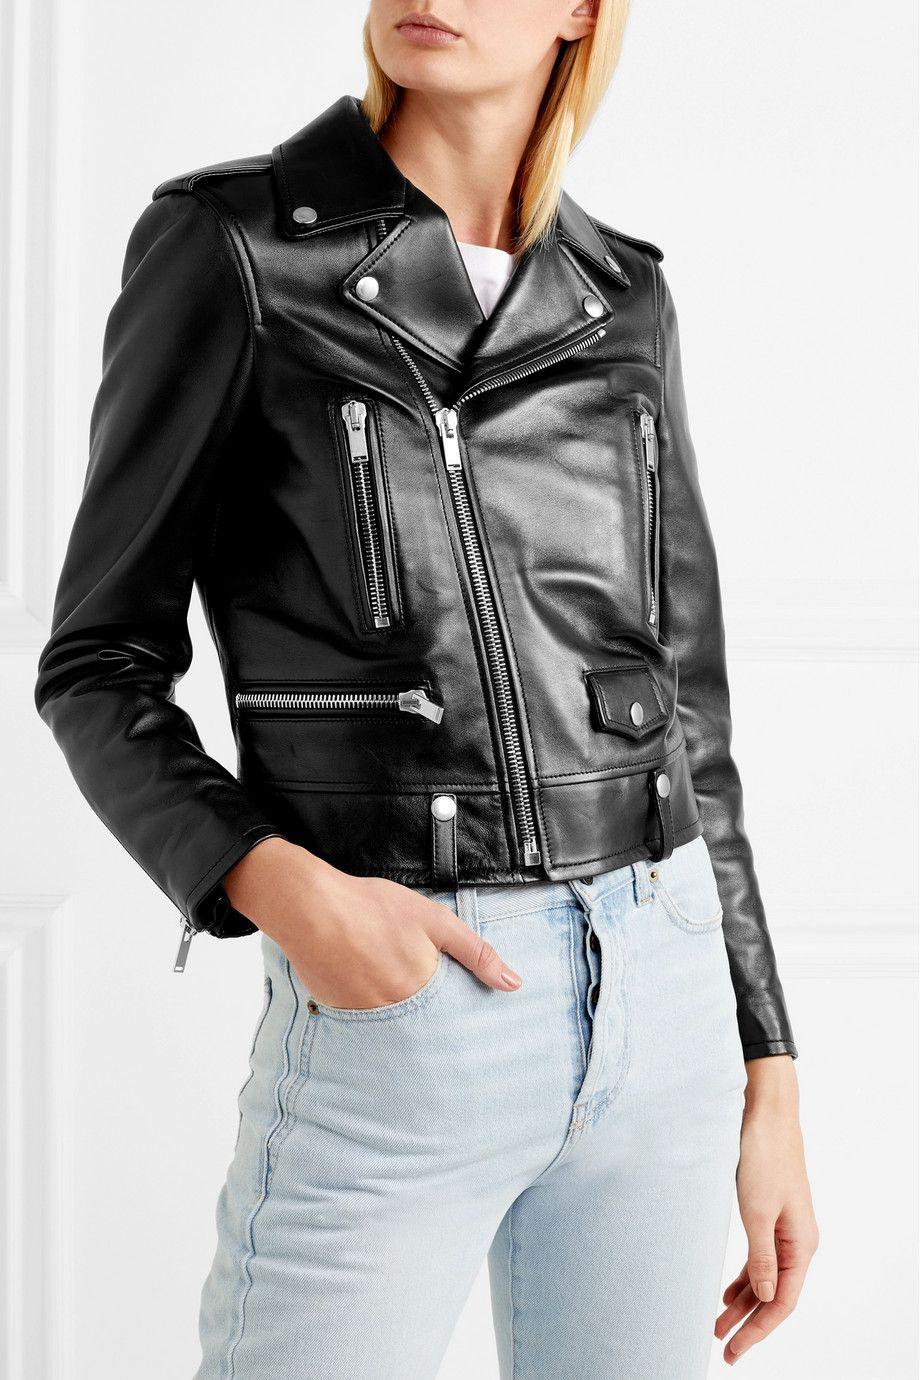 Saint Laurent Perfecto leather biker jacket 4,990